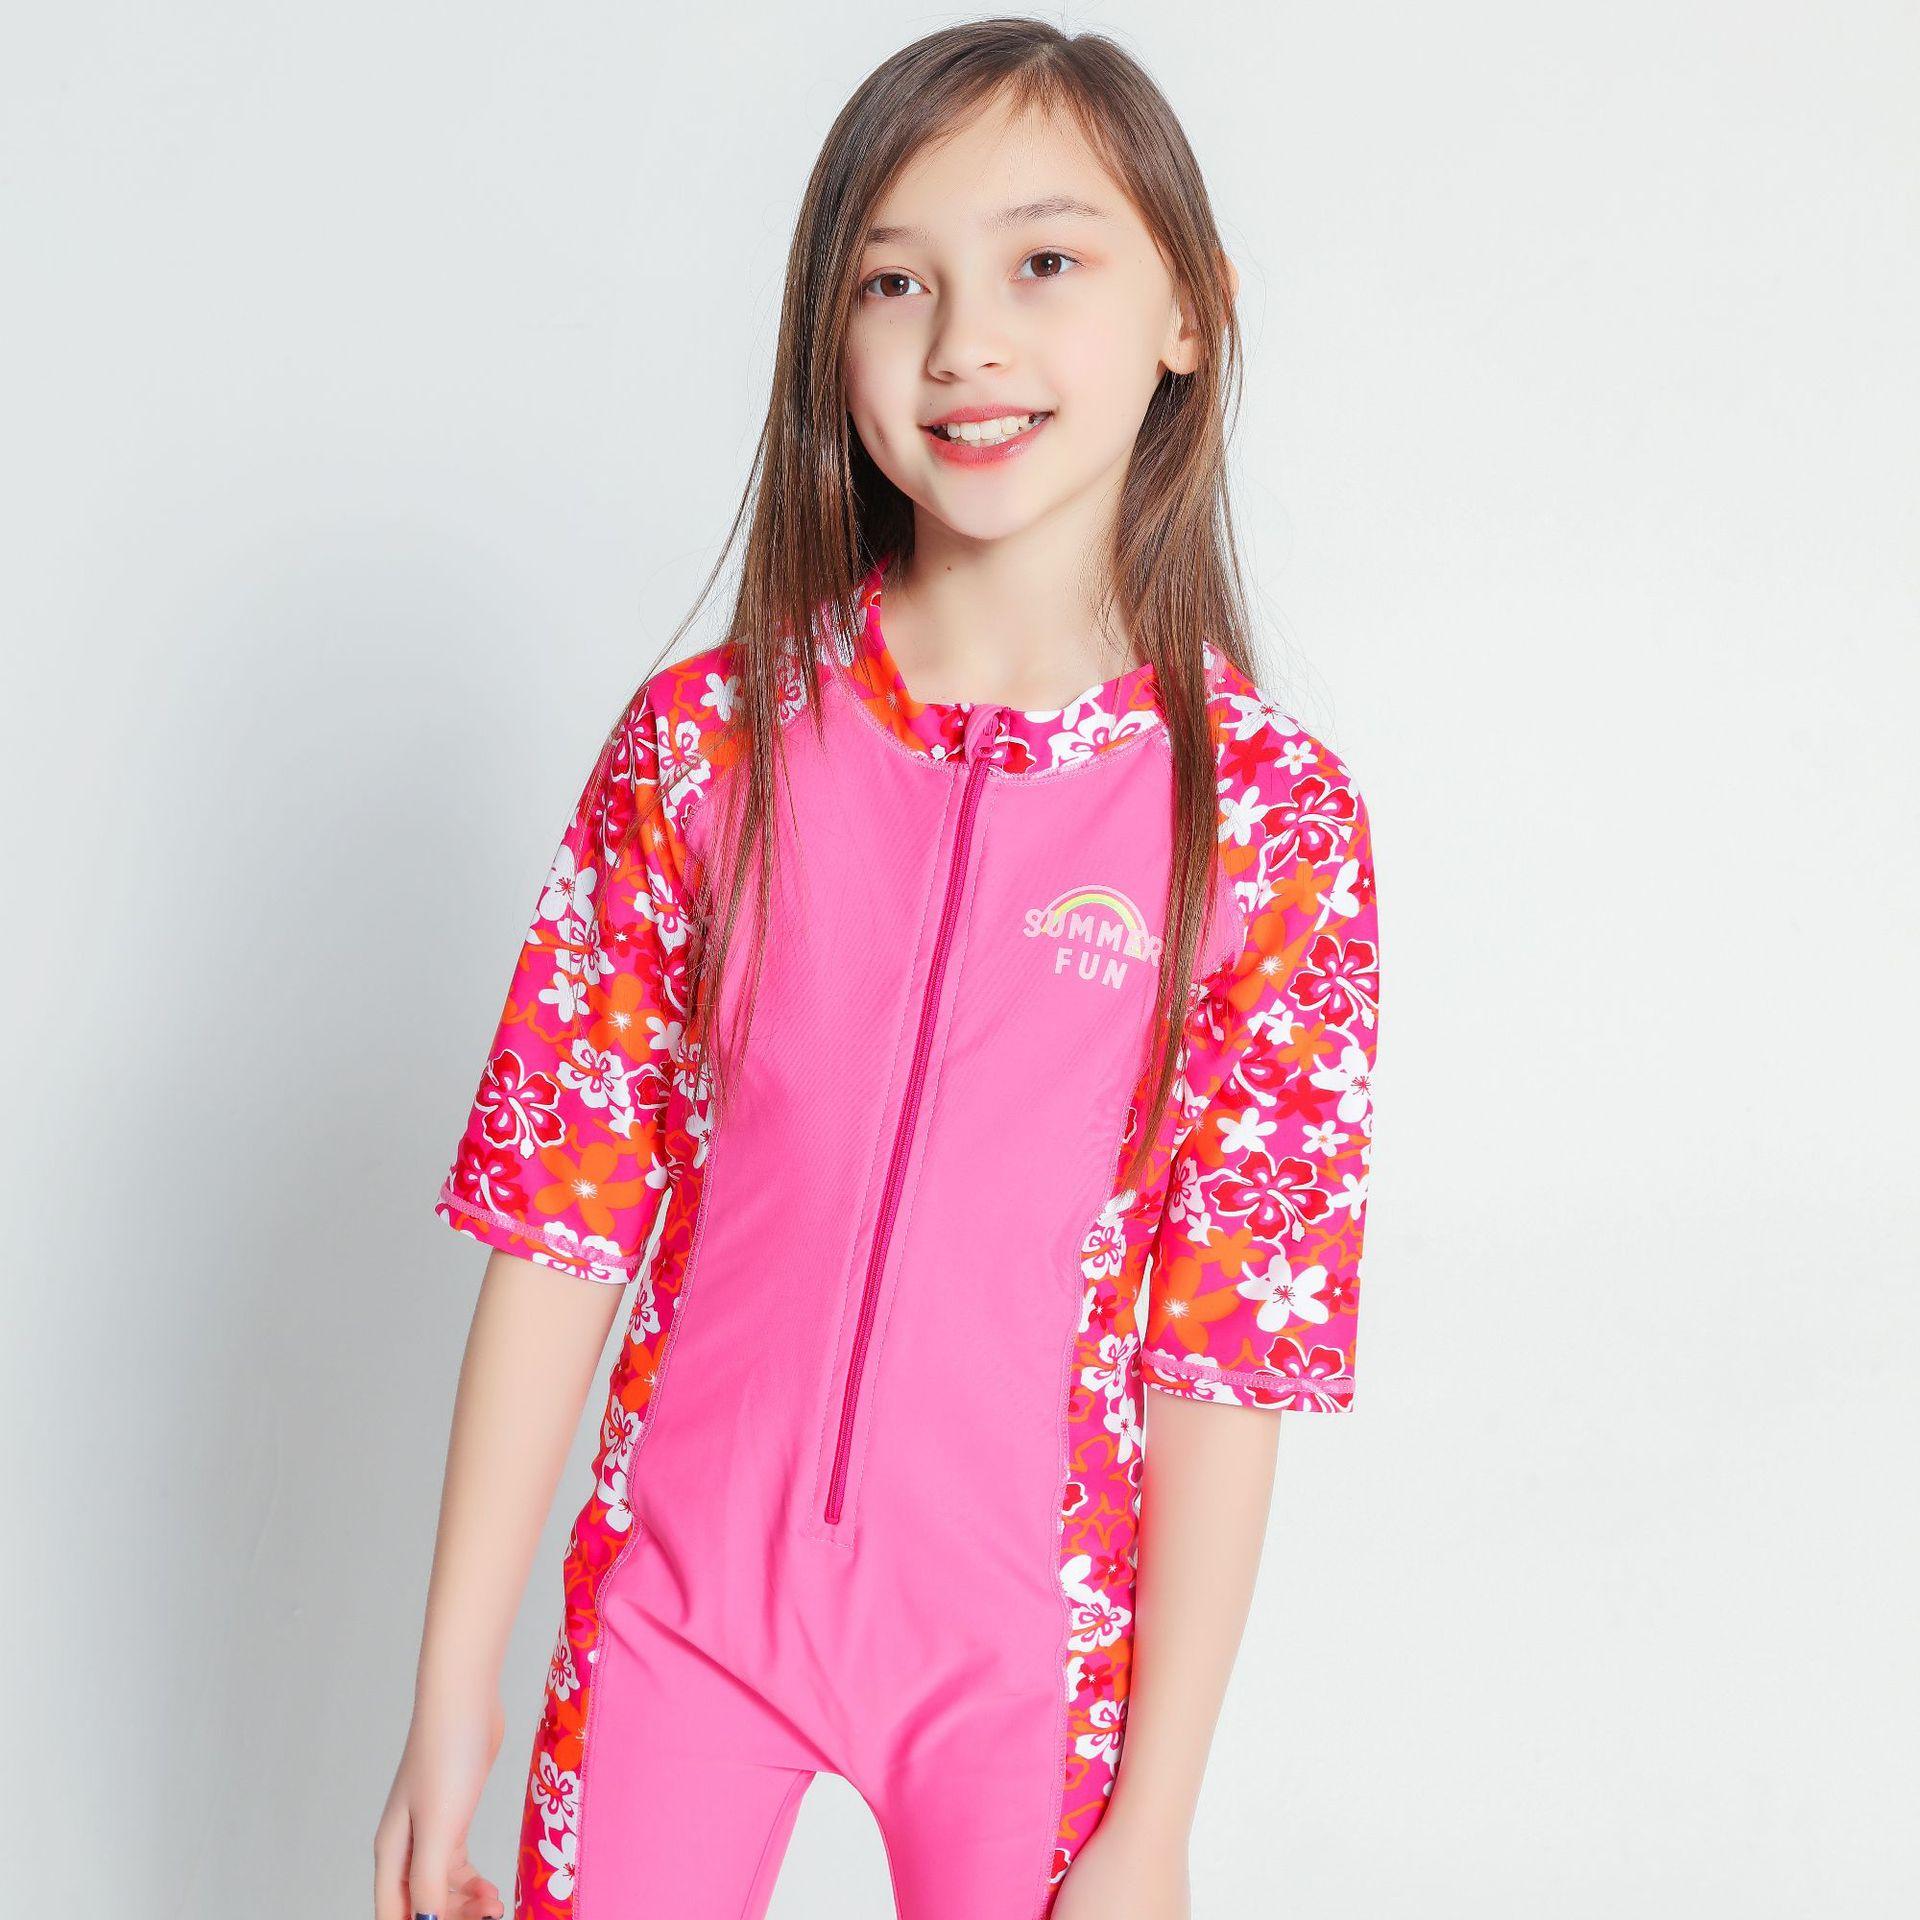 2019 Girls Anti-zi Brocade Urethane Elastic Fibre Flower Mixed Colors Half-sleeve Shirt One-piece CHILDREN'S Swimwear Beach Bath